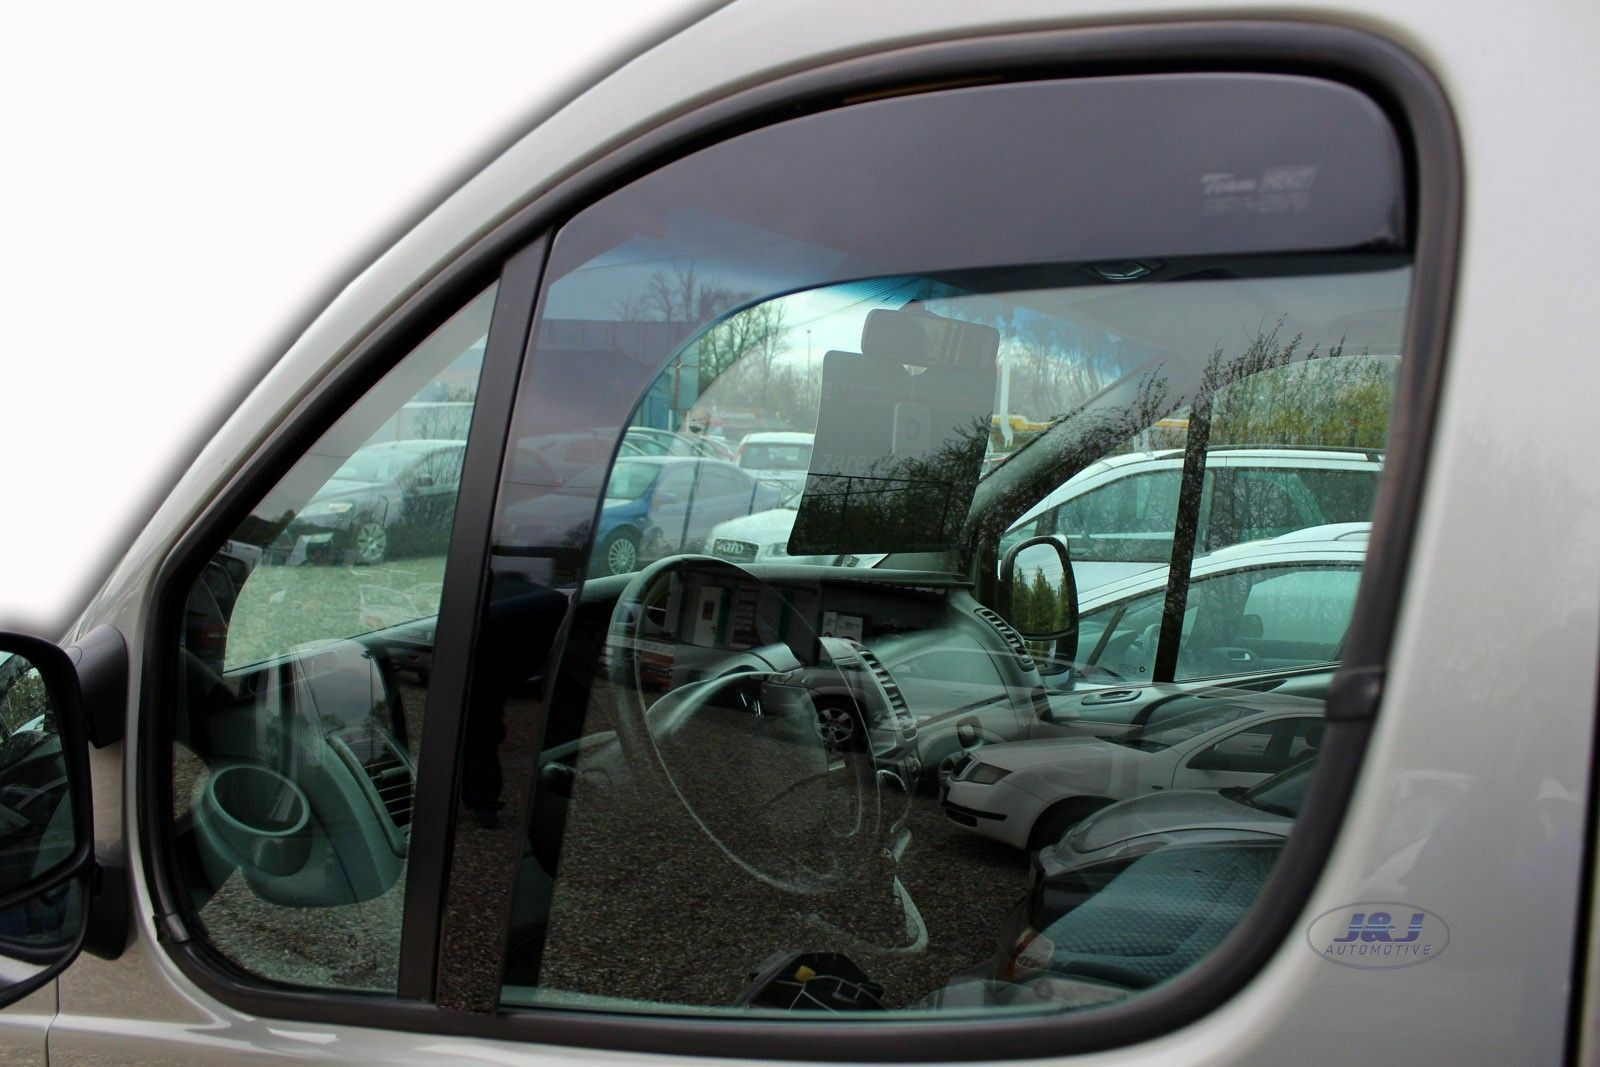 J/&J AUTOMOTIVE Deflecteurs dair d/éflecteurs de Vent Compatible avec Opel Movano 2 Portes 1998-2010 2 pi/èces